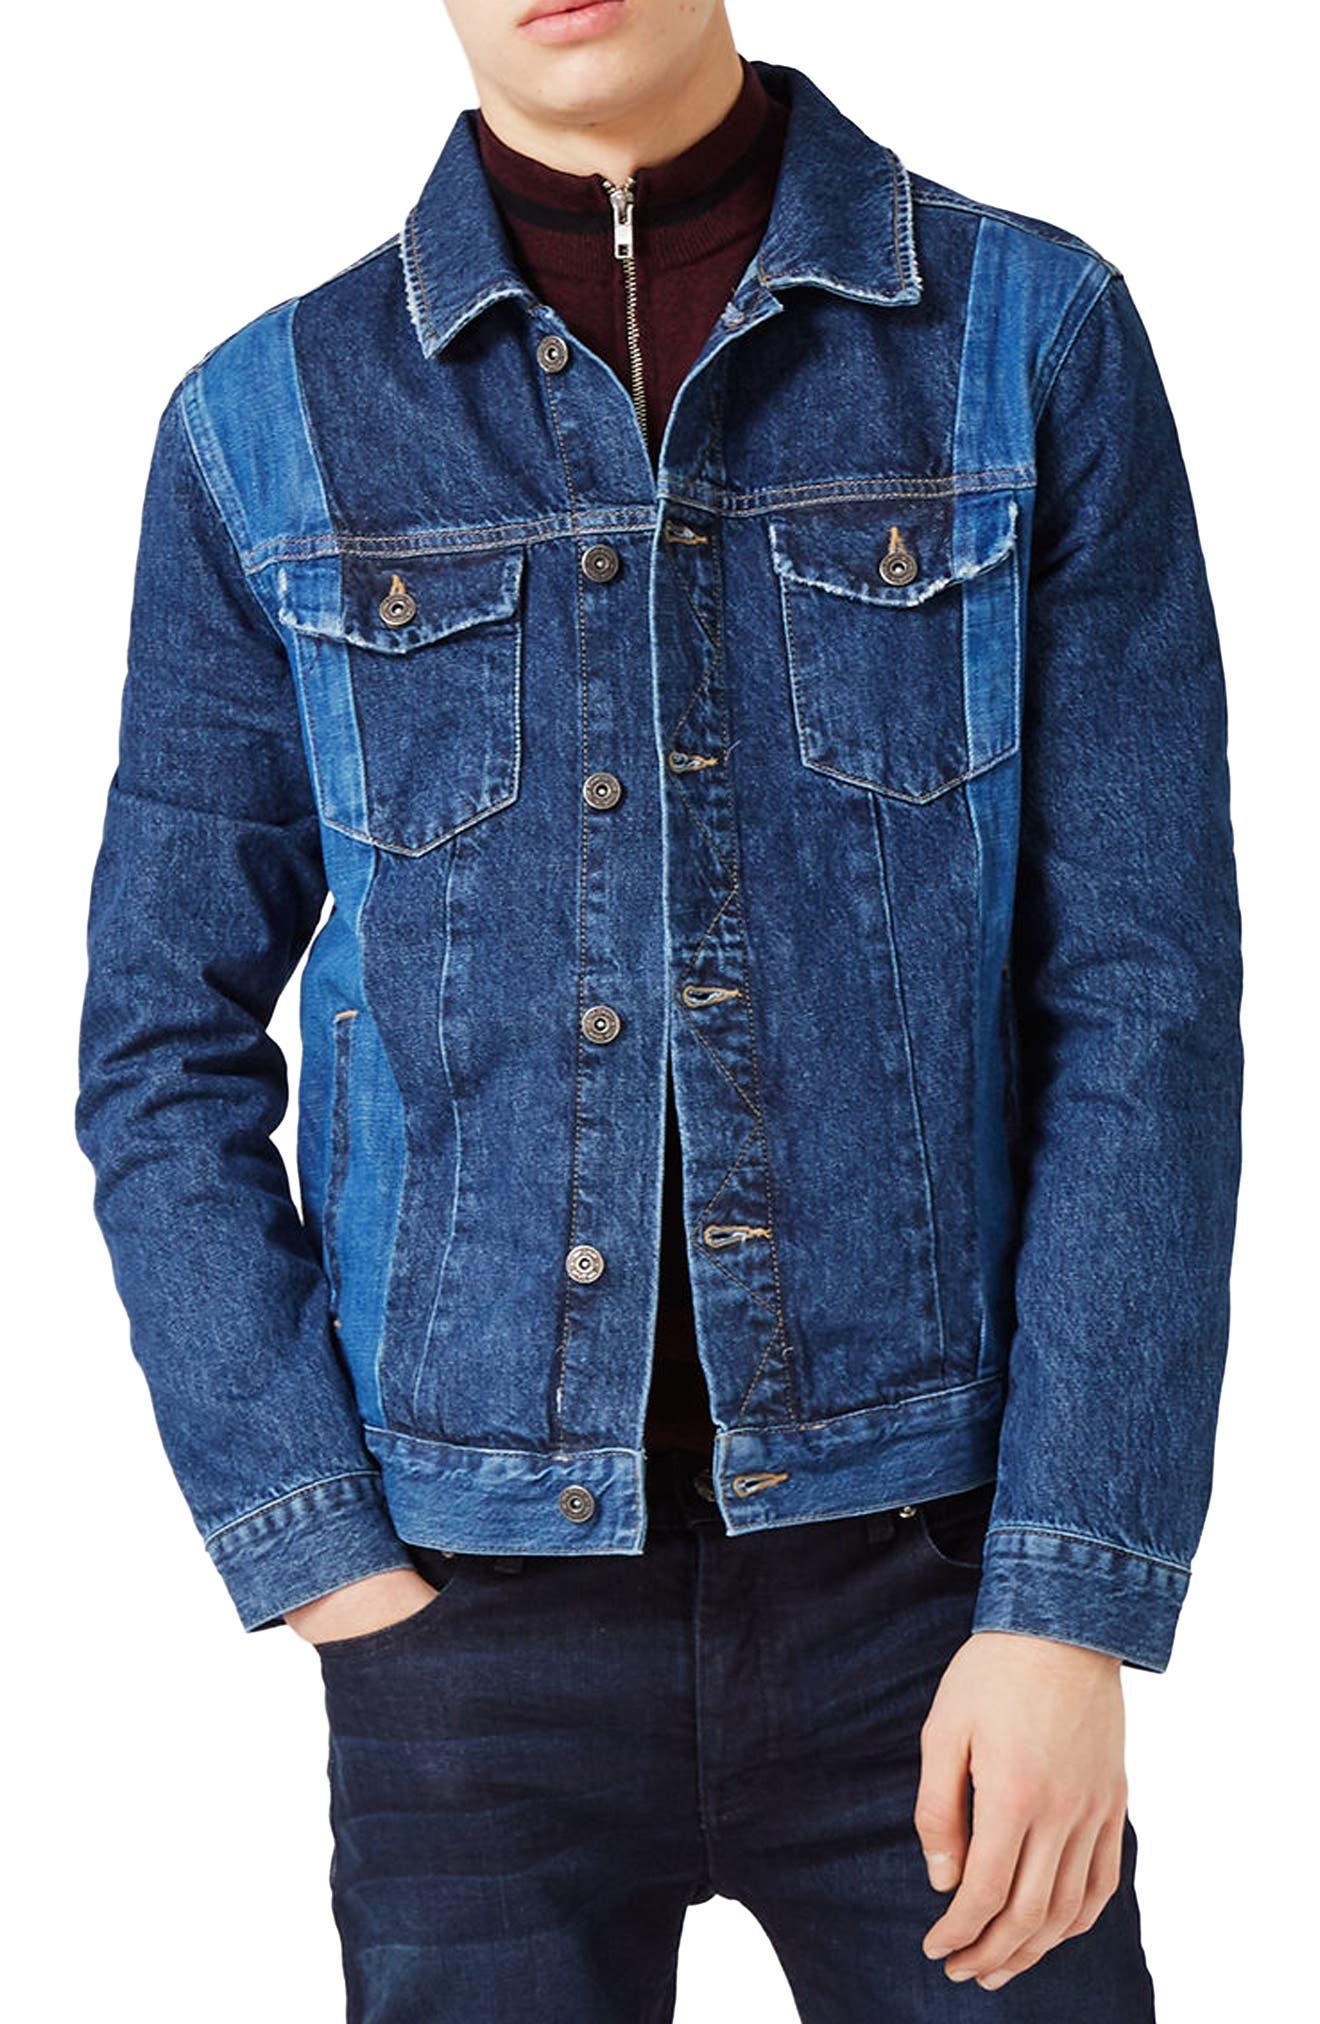 Alternate Image 1 Selected - Topman Two-Tone Denim Jacket